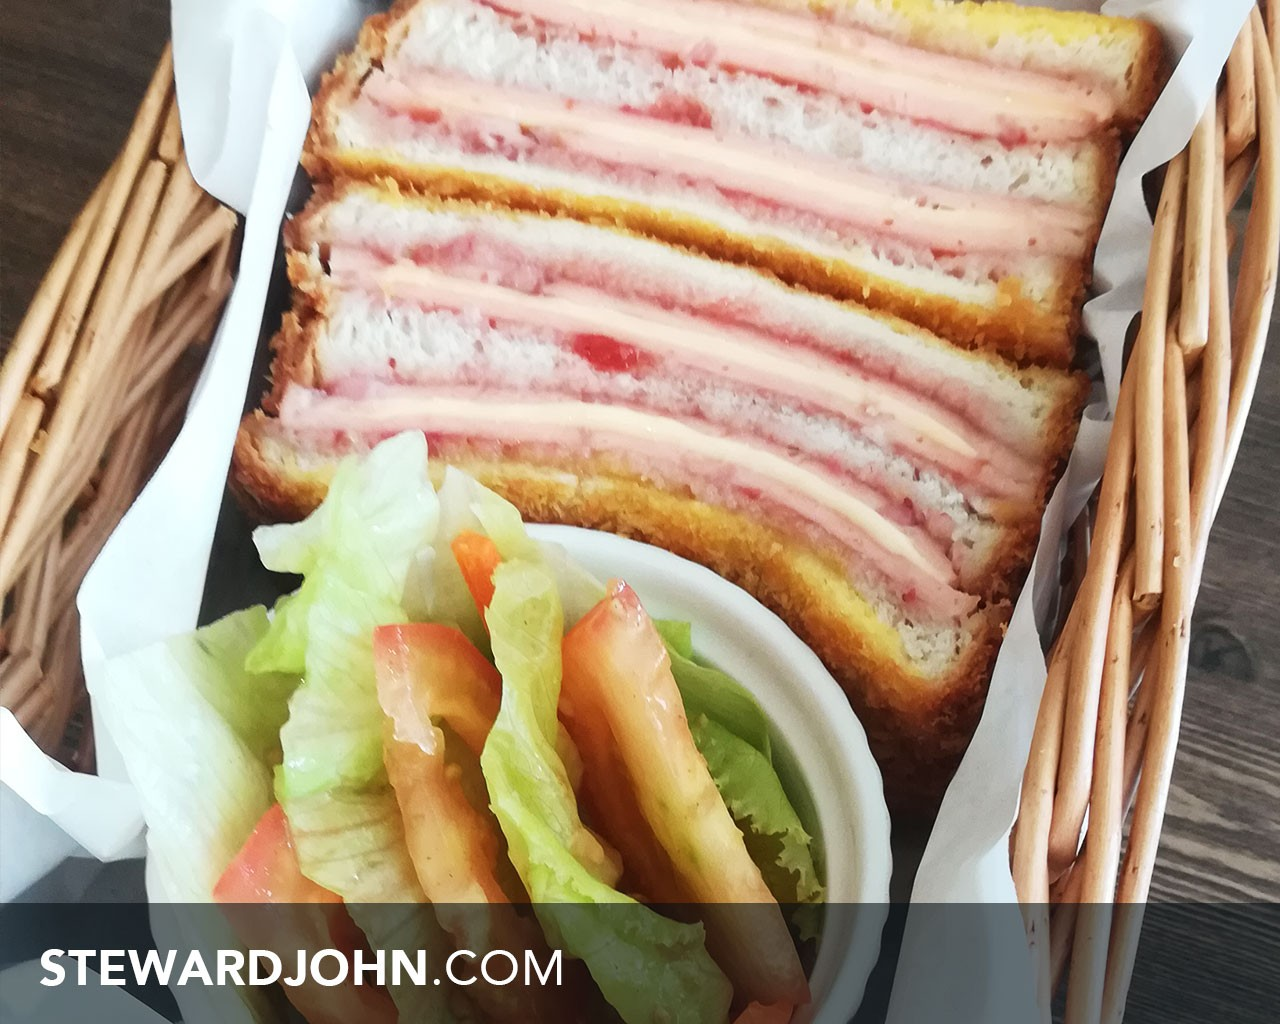 Joox Cafe Monte cristo sandwich